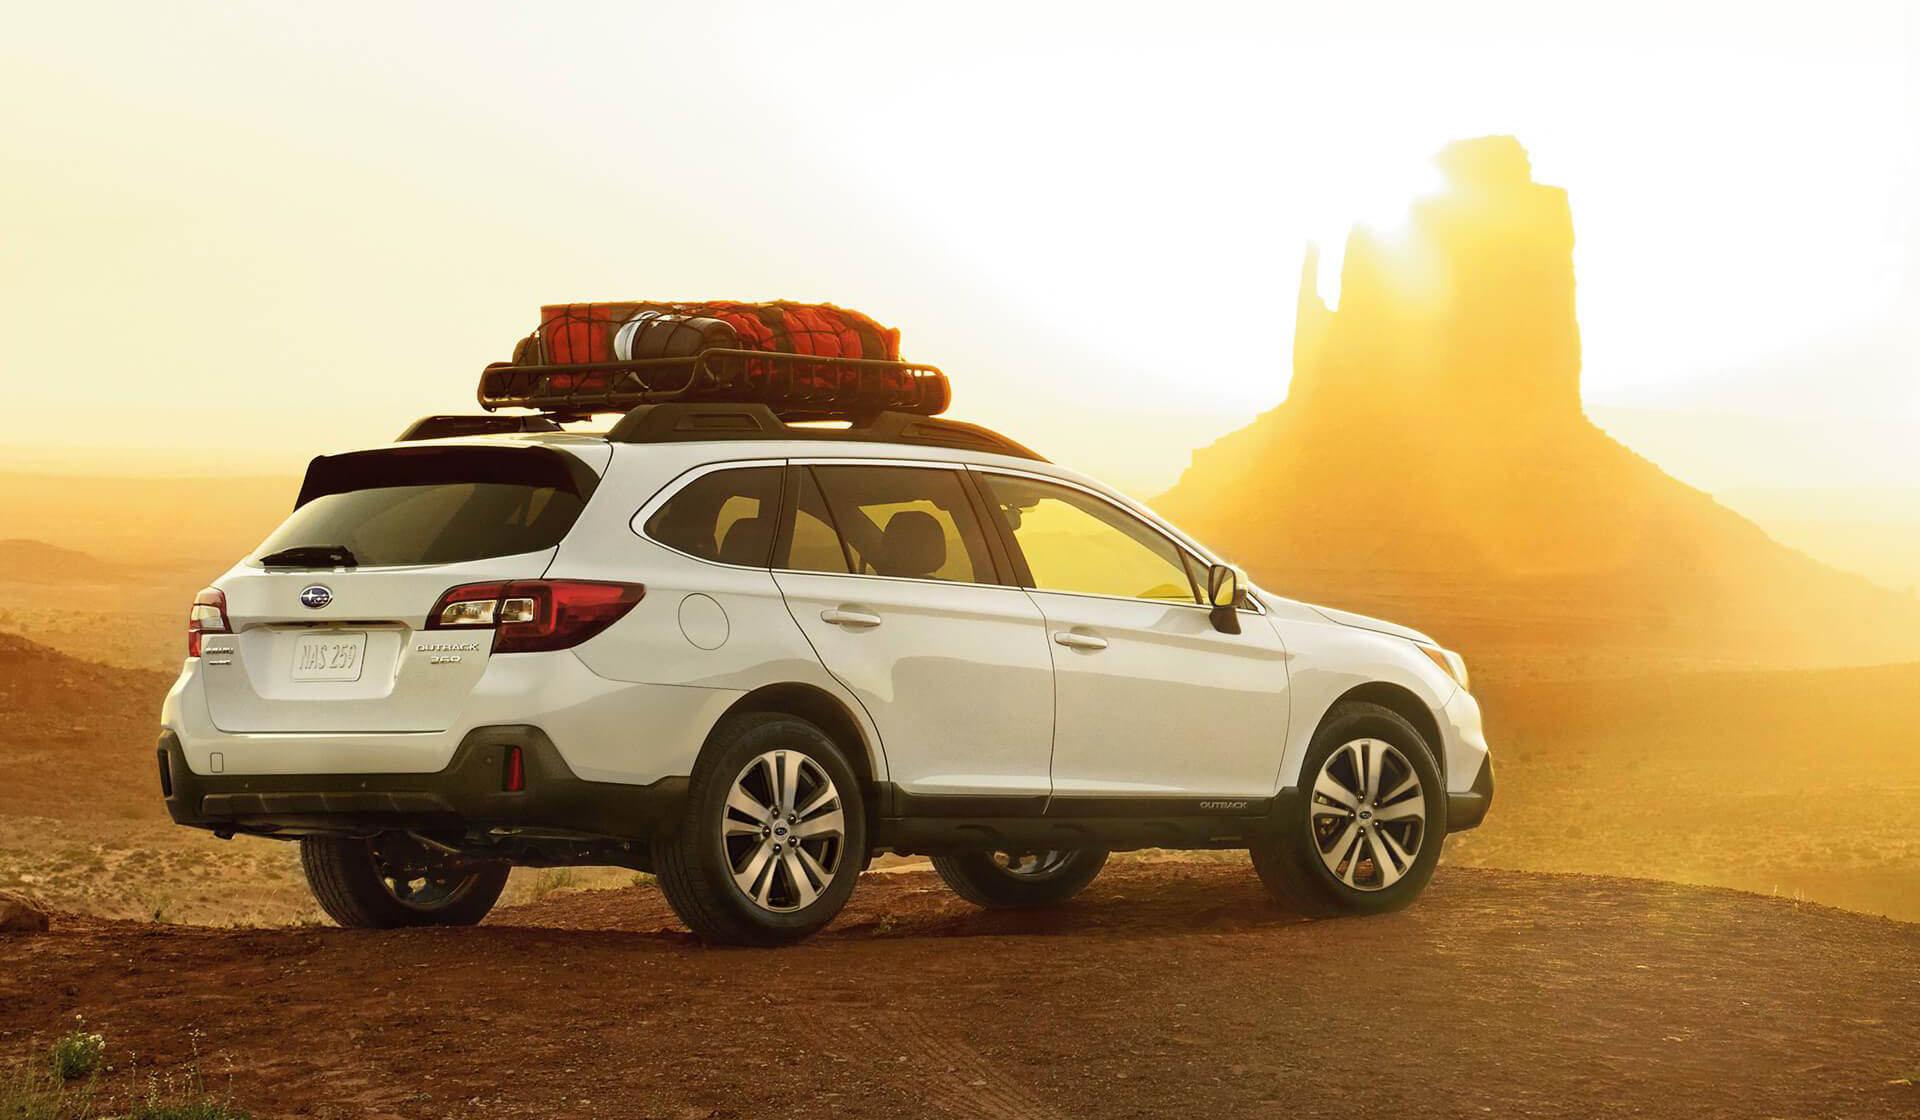 Subaru Outback 2018 Llmotors